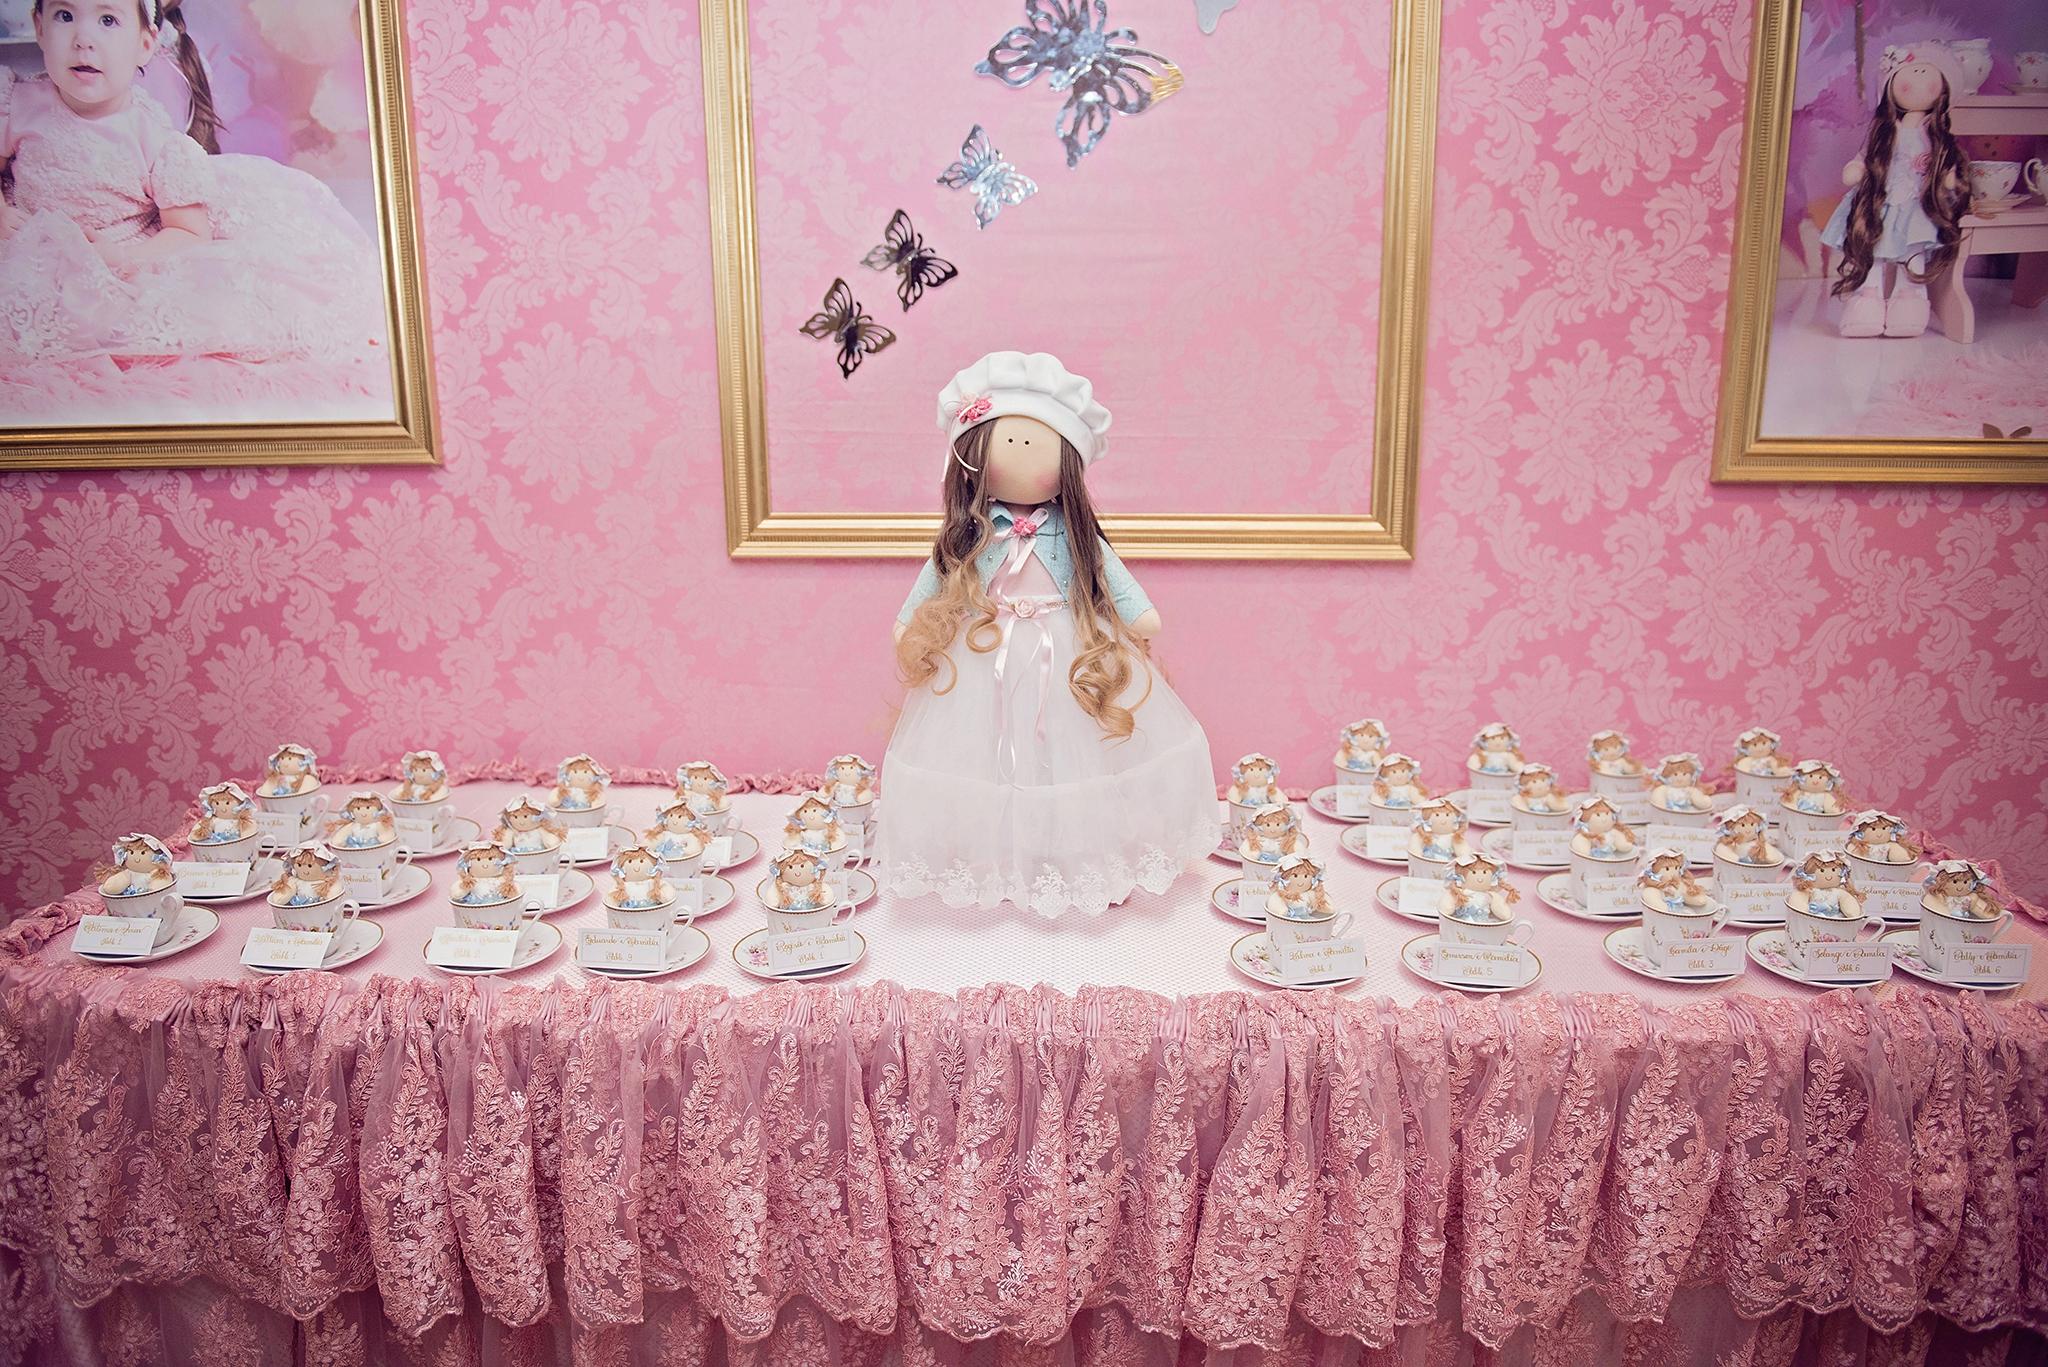 NJ-NY-cakesmash-birthday-Photographer-012.JPG